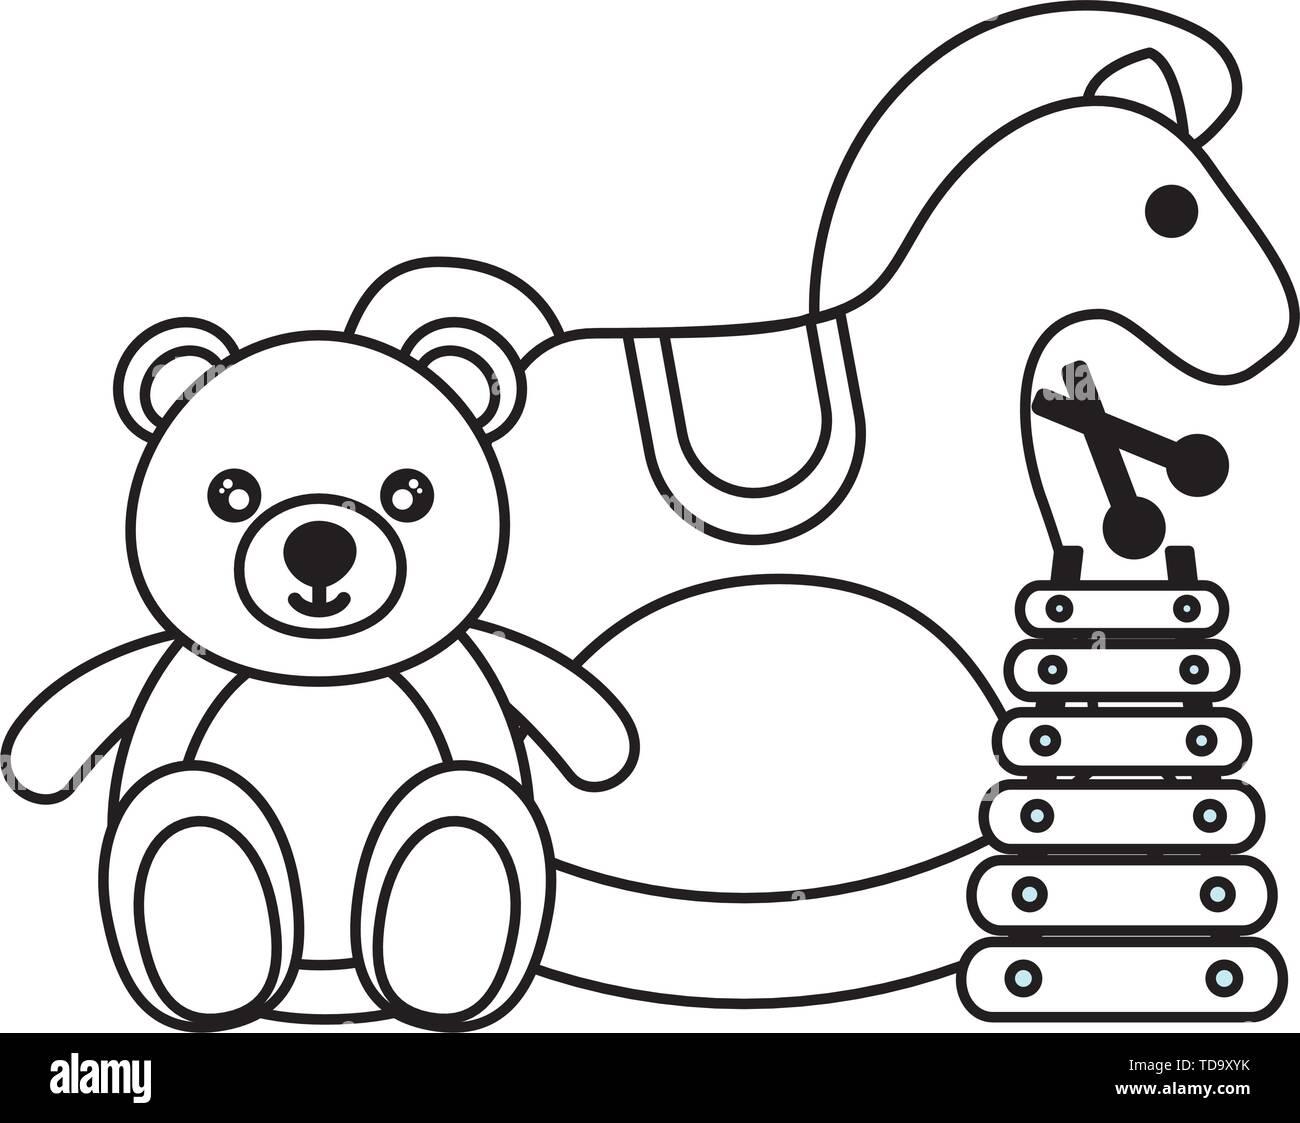 Rocking Horse Bear Xylophone Kids Toys Stock Vector Image Art Alamy